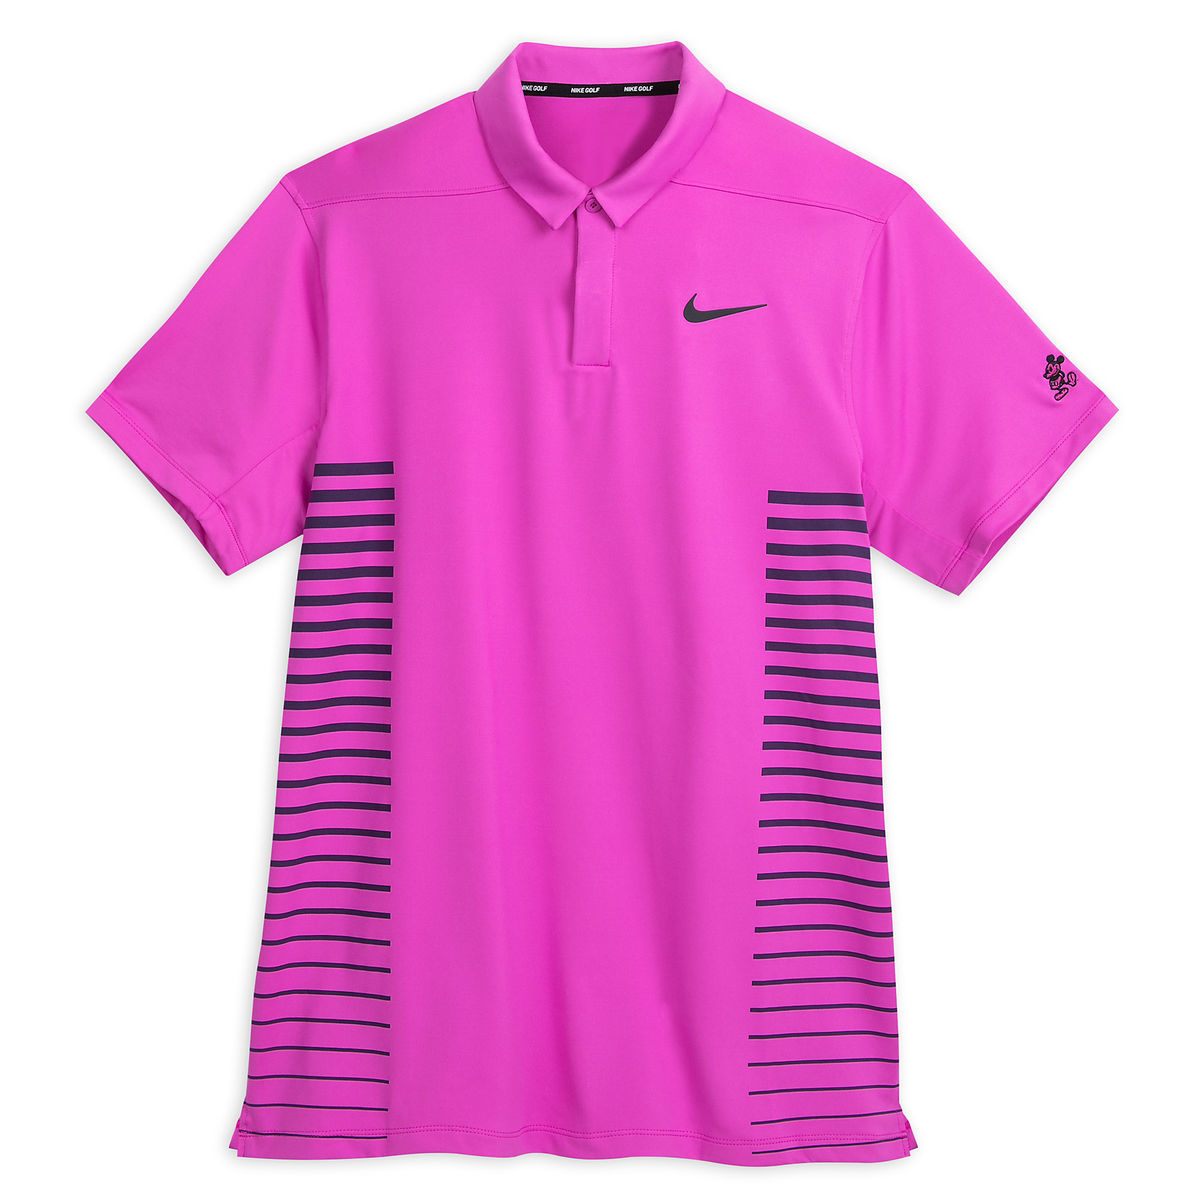 Disney Polo Shirt For Men Nike Golf Mickey Mouse Magenta Stripe